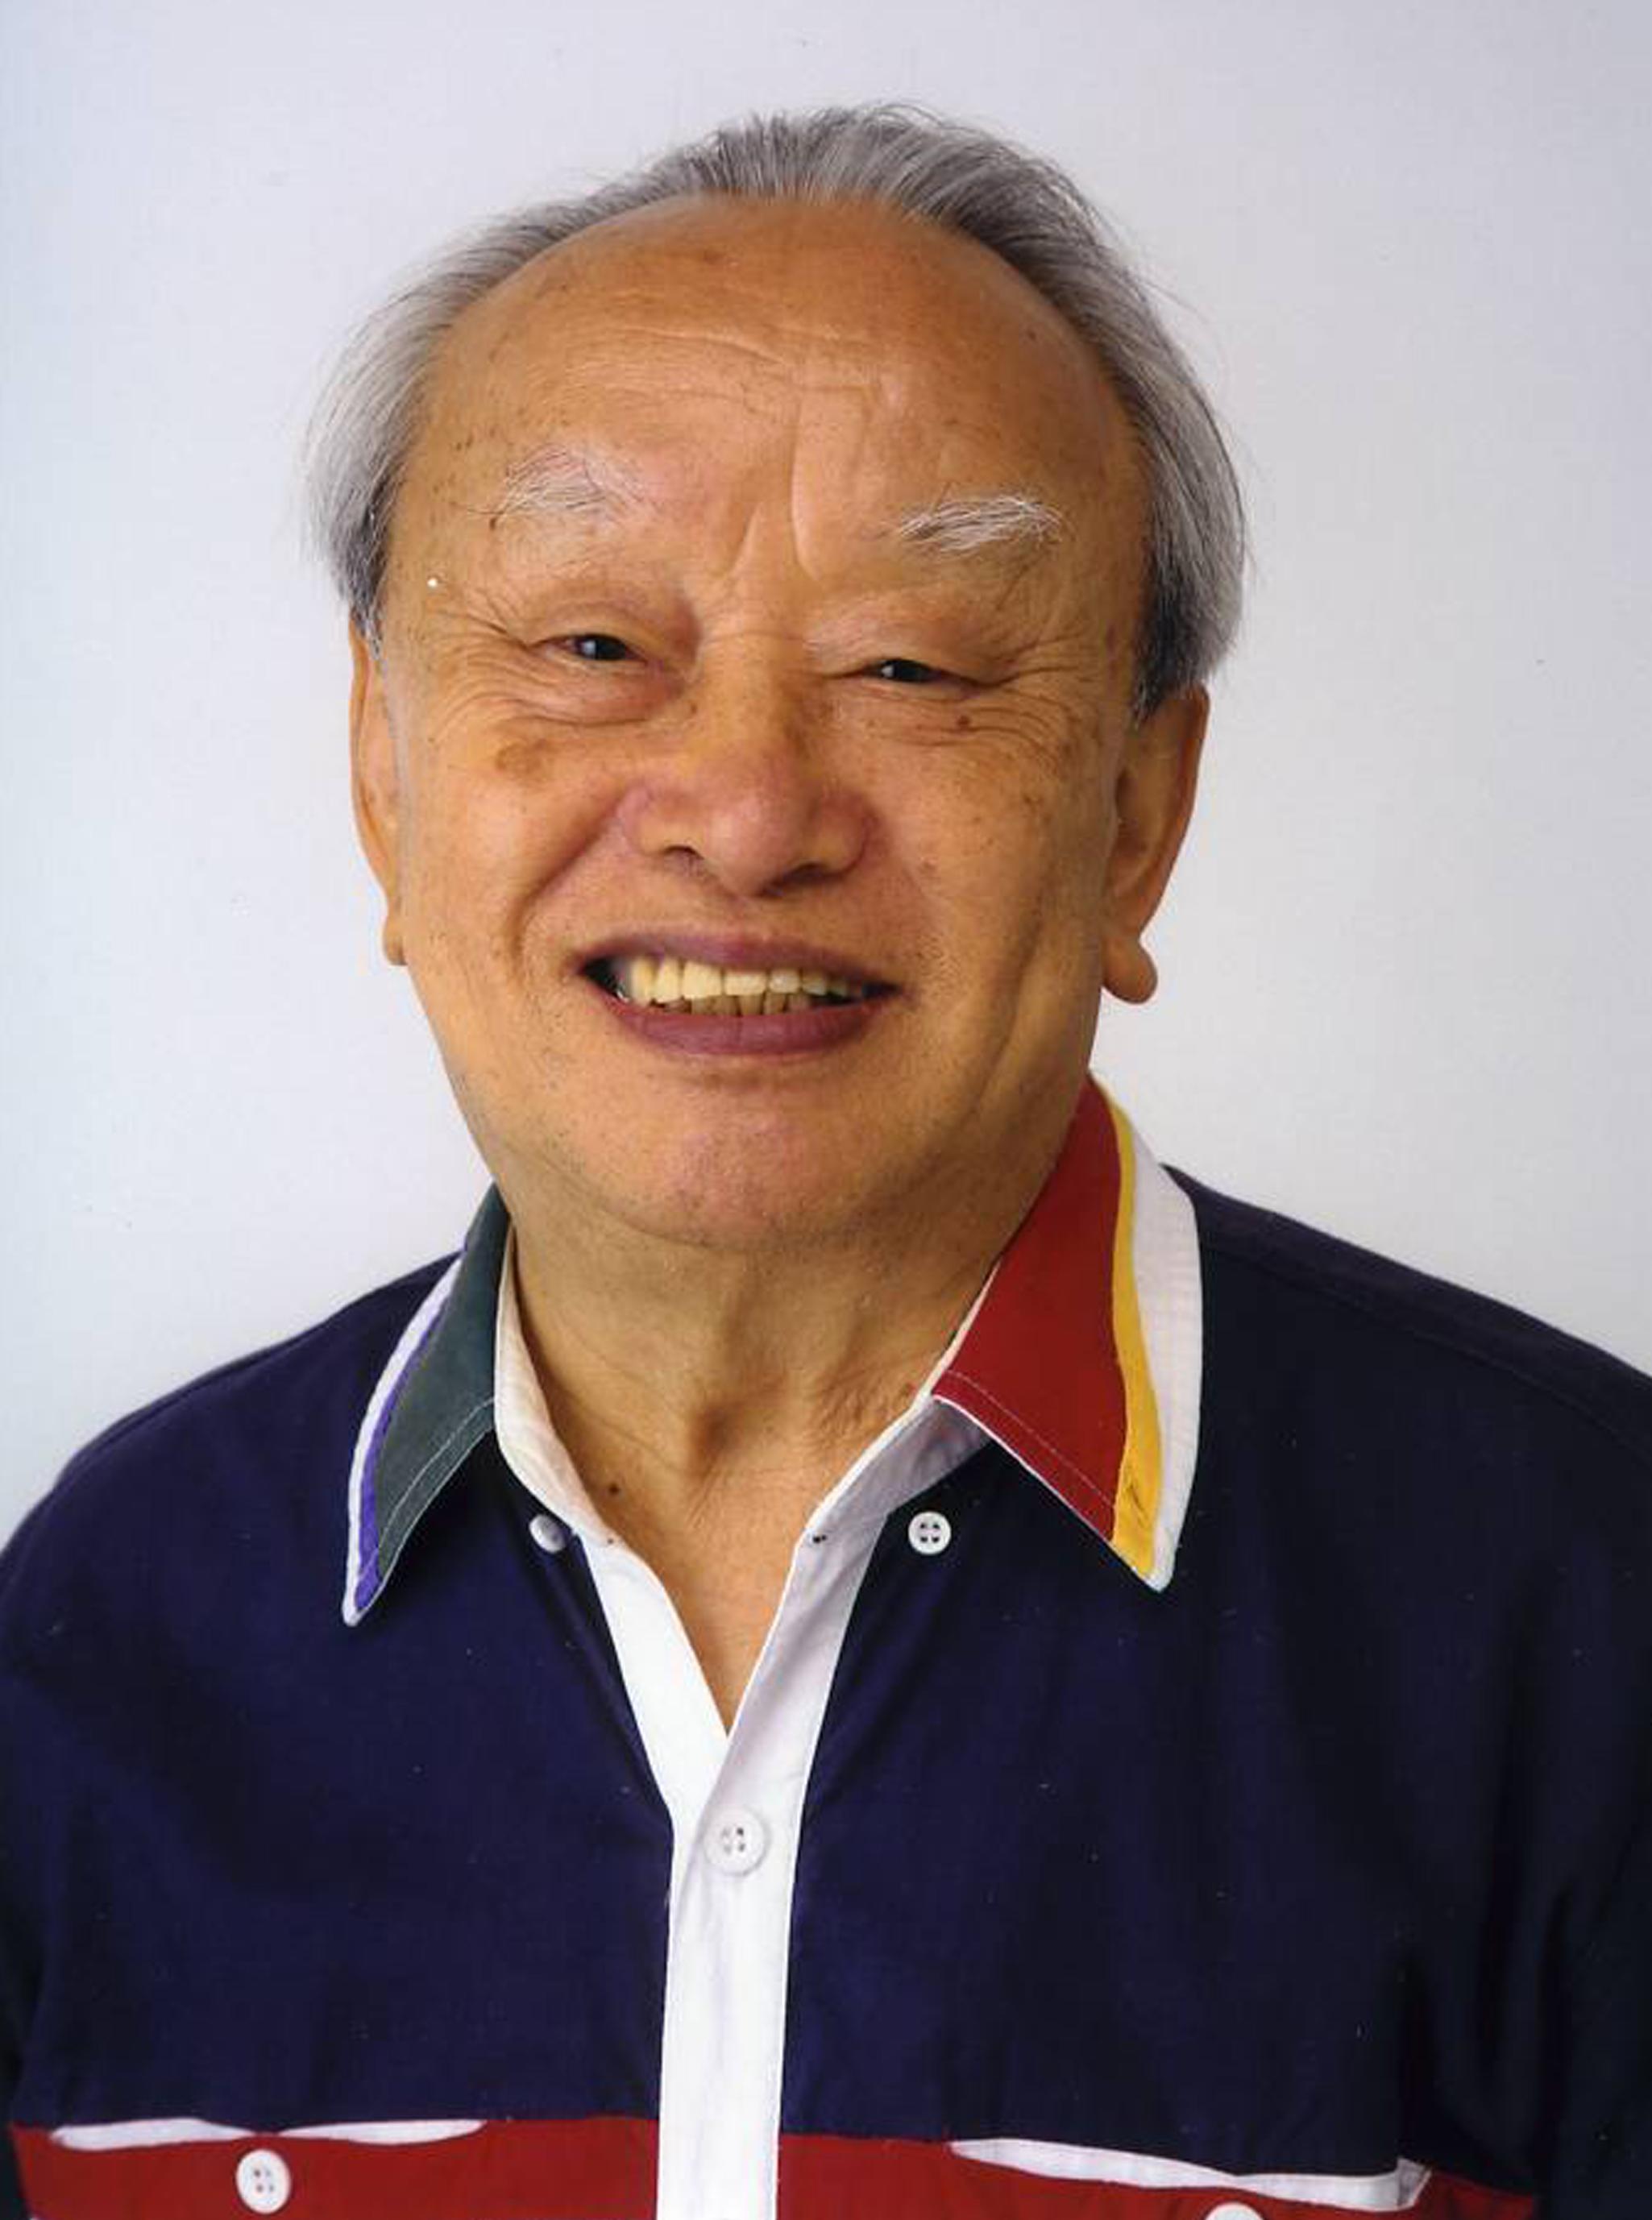 File:MahitoTsujimura.png